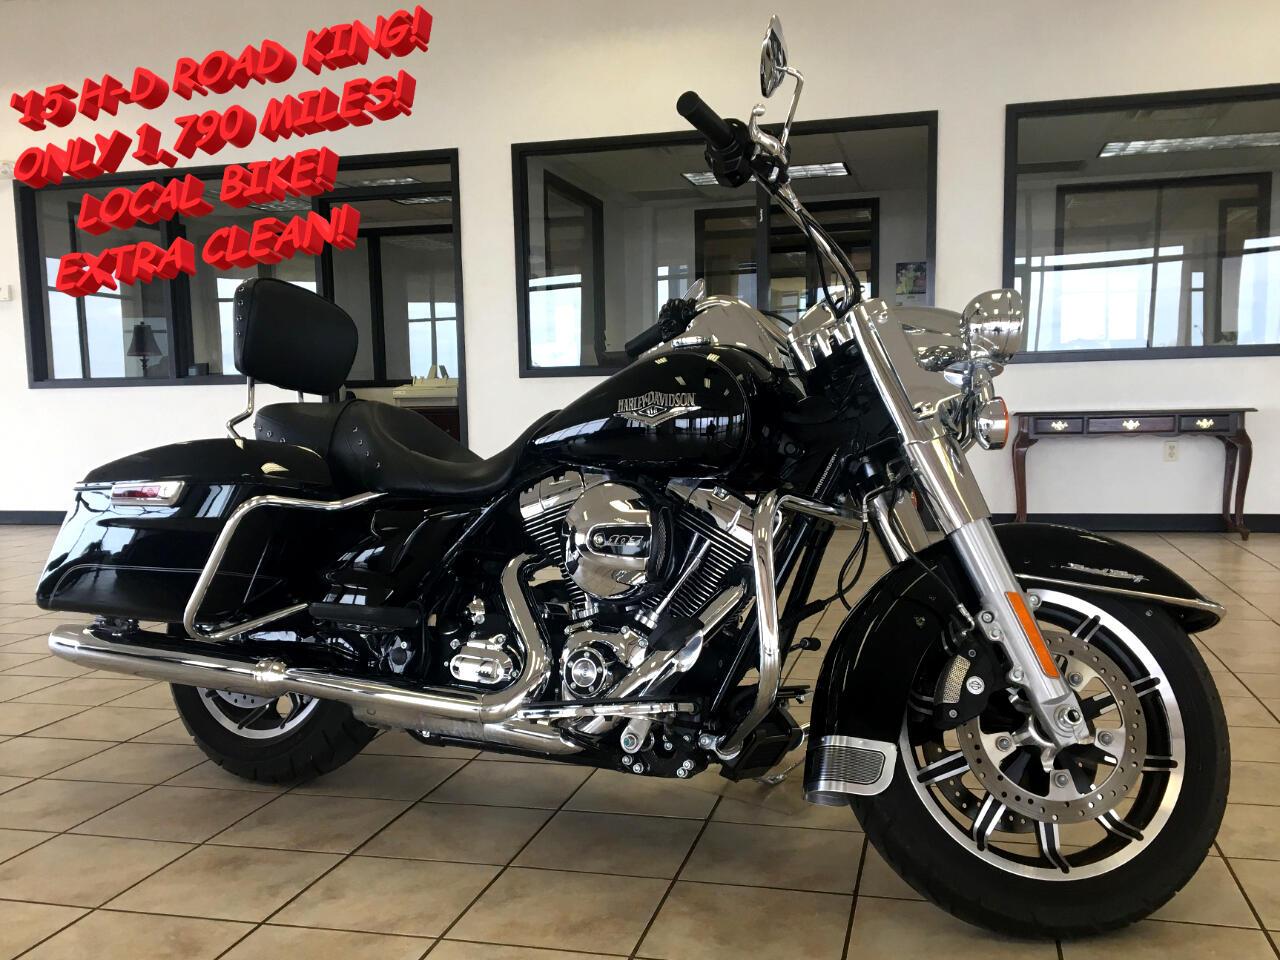 2015 Harley-Davidson Road King Classic